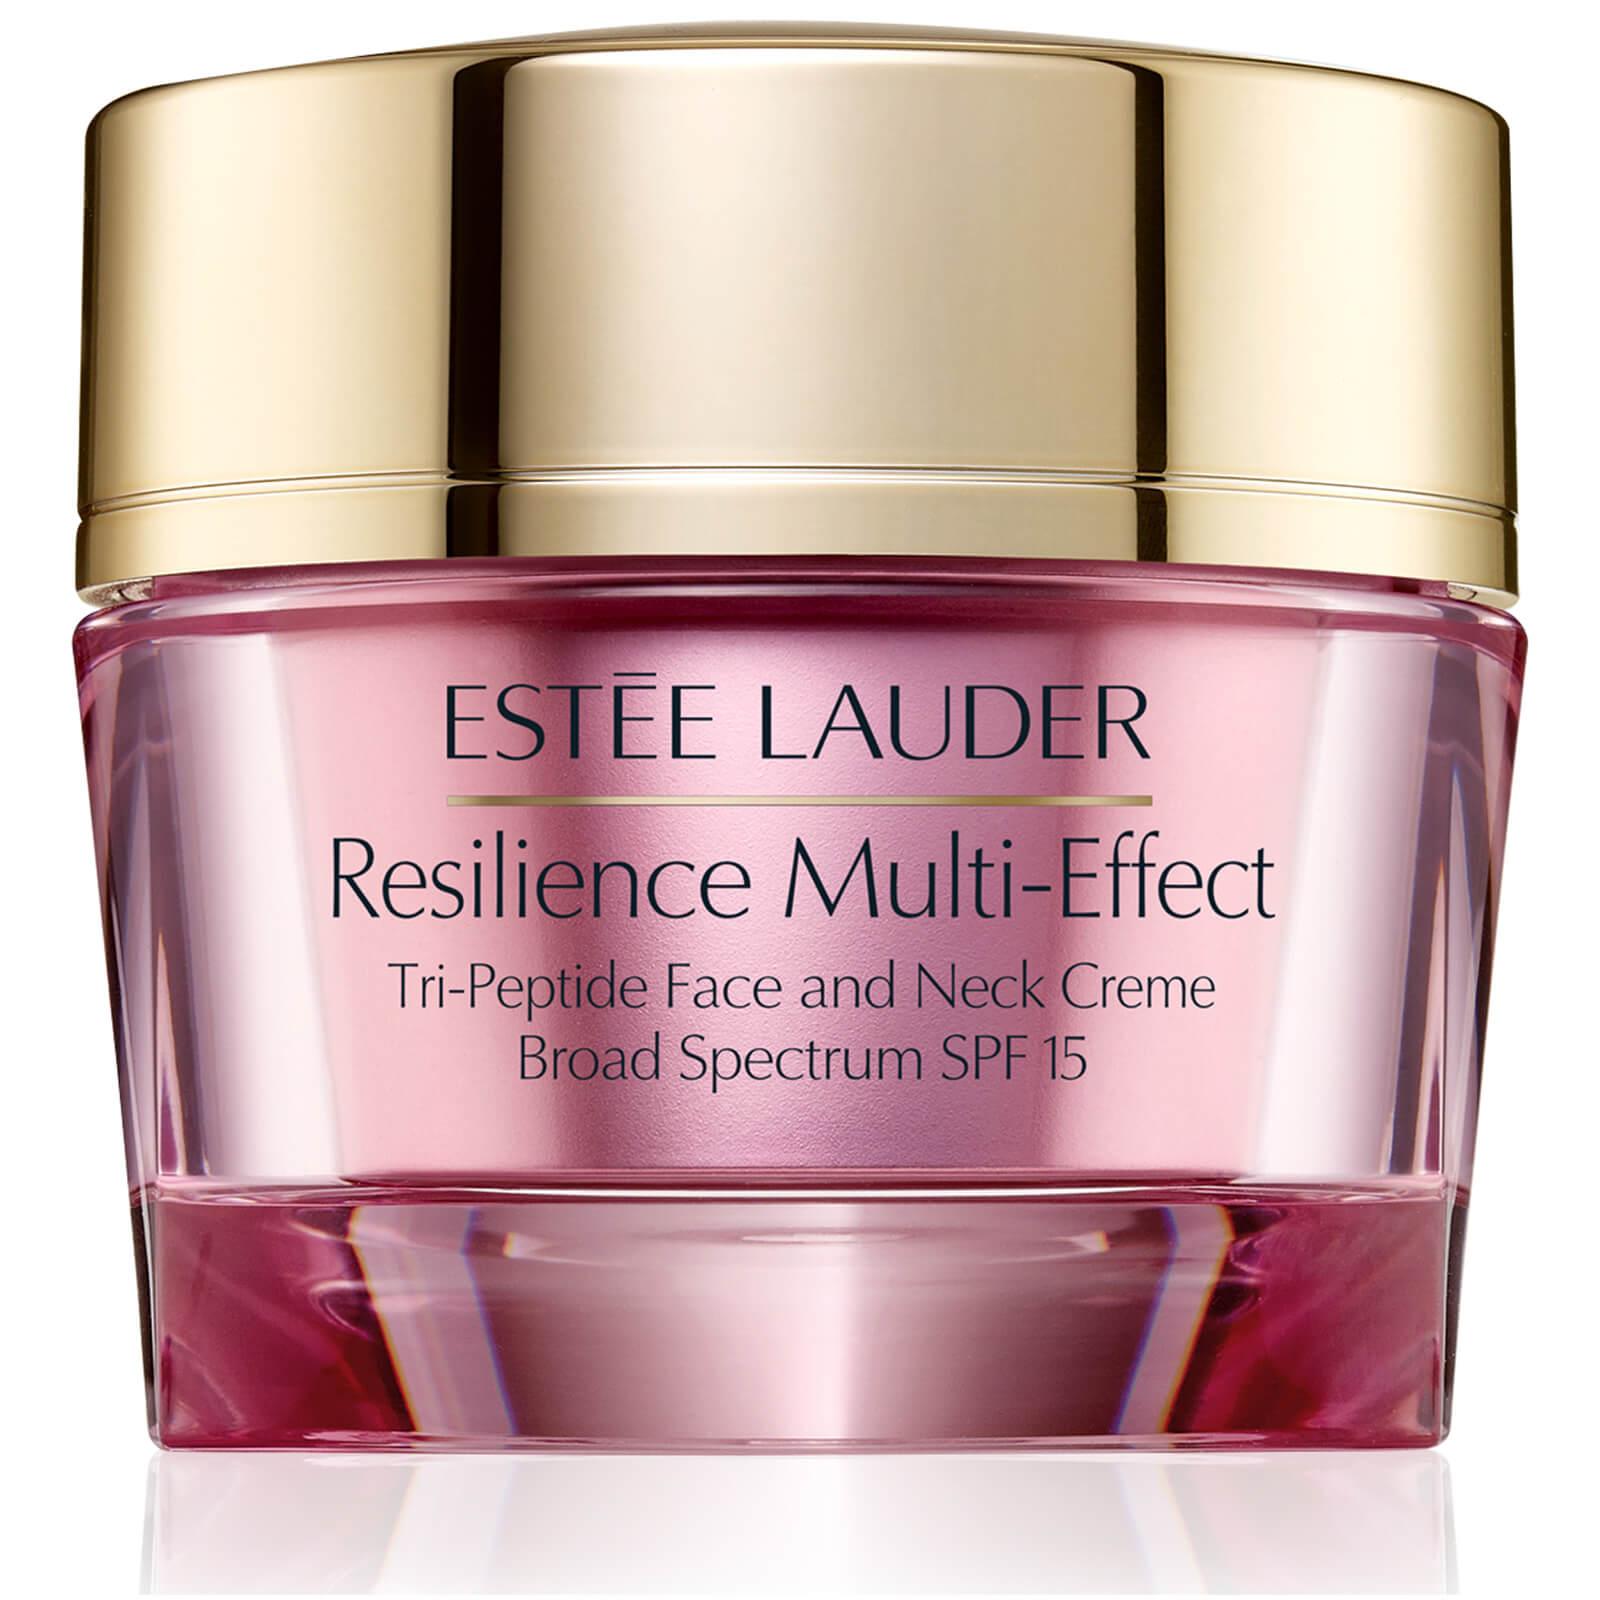 Estée Lauder Resilience Multi-Effect Tri-Peptide Face and Neck Crème SPF15 for Dry Skin 50ml